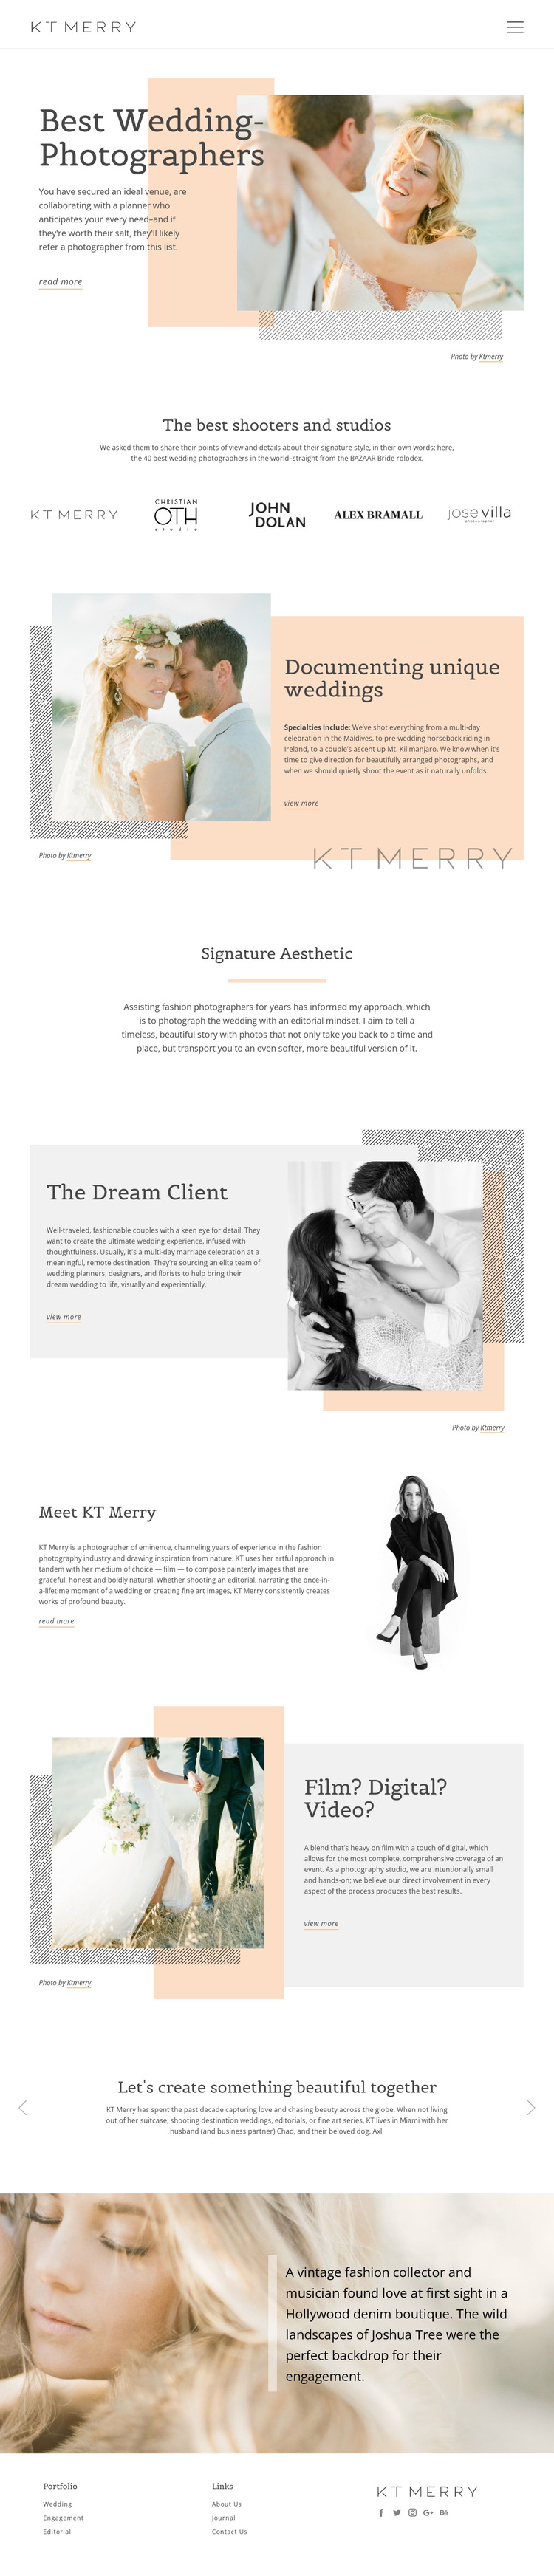 Wedding Photographers Joomla Page Builder